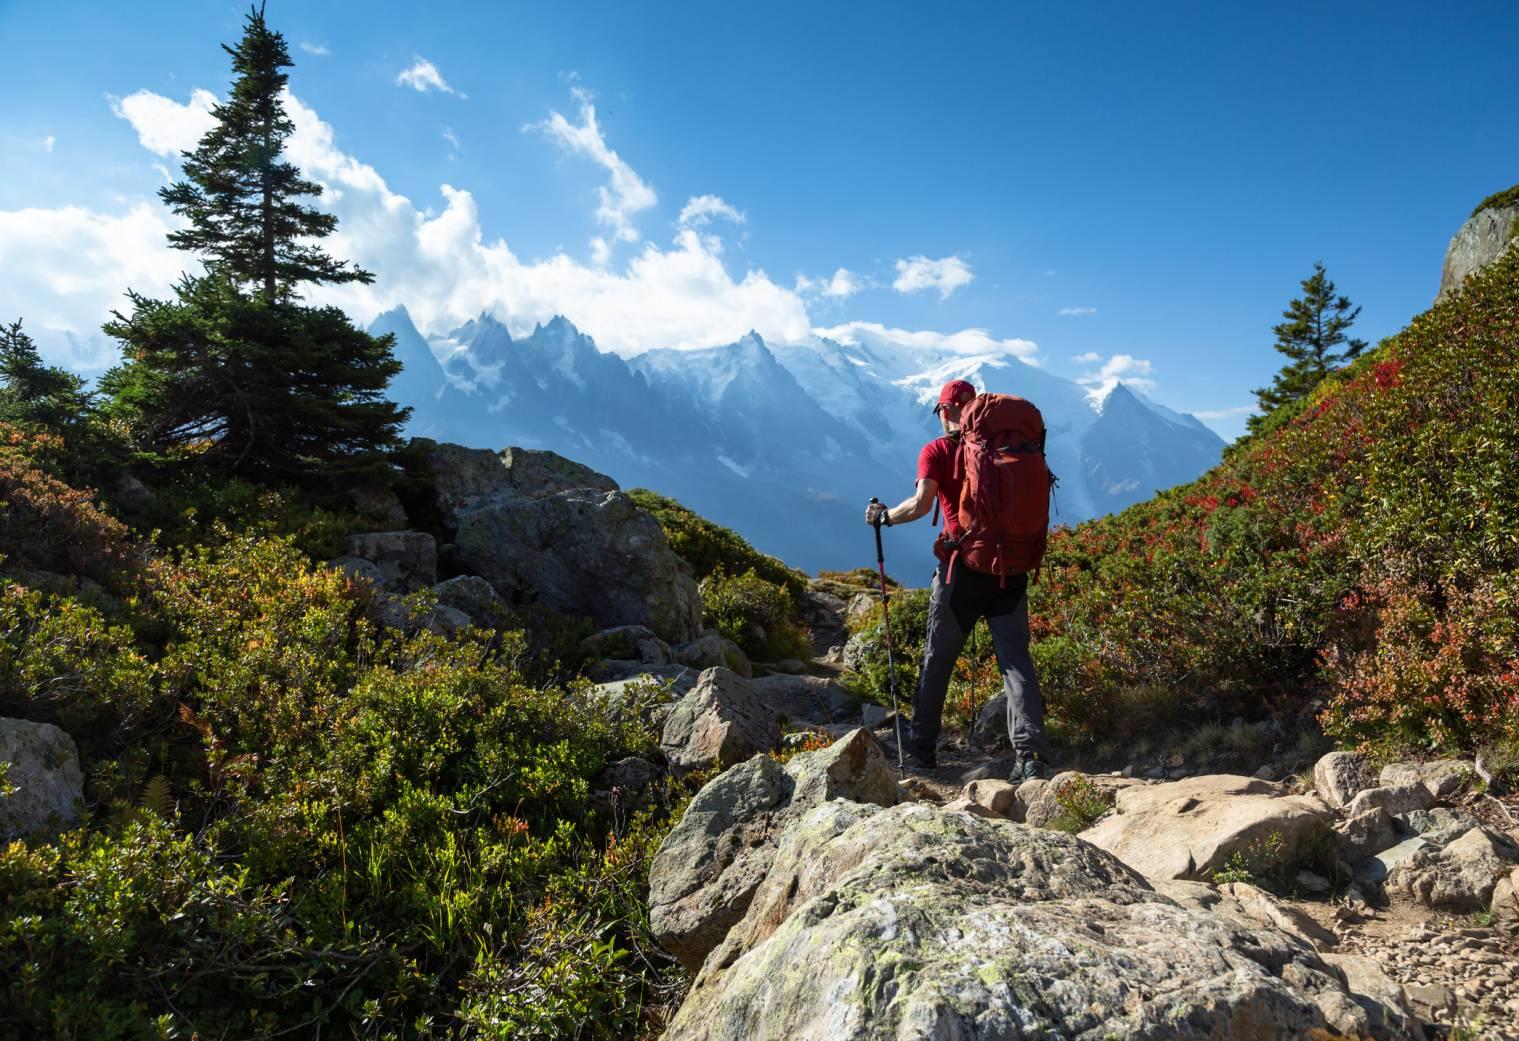 Image preparer demenagement montagne